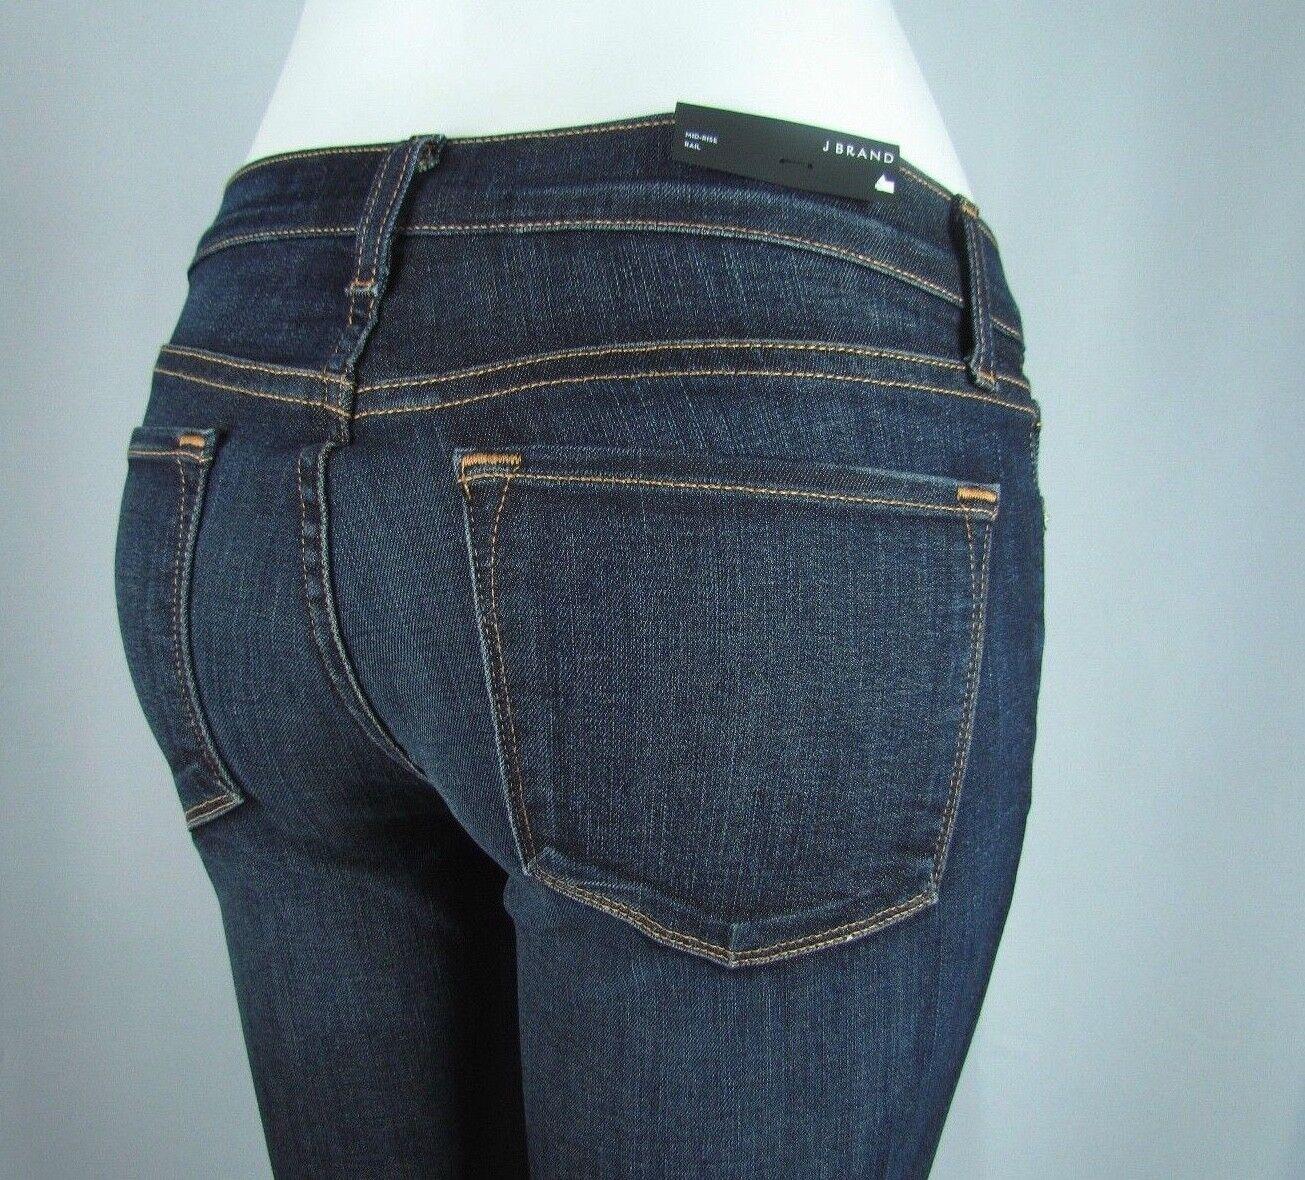 New J BRAND 8112 Mid Rise Rail SKINNY LEG Woman Jeans SZ 28 IN DARK VINTAGE blueE